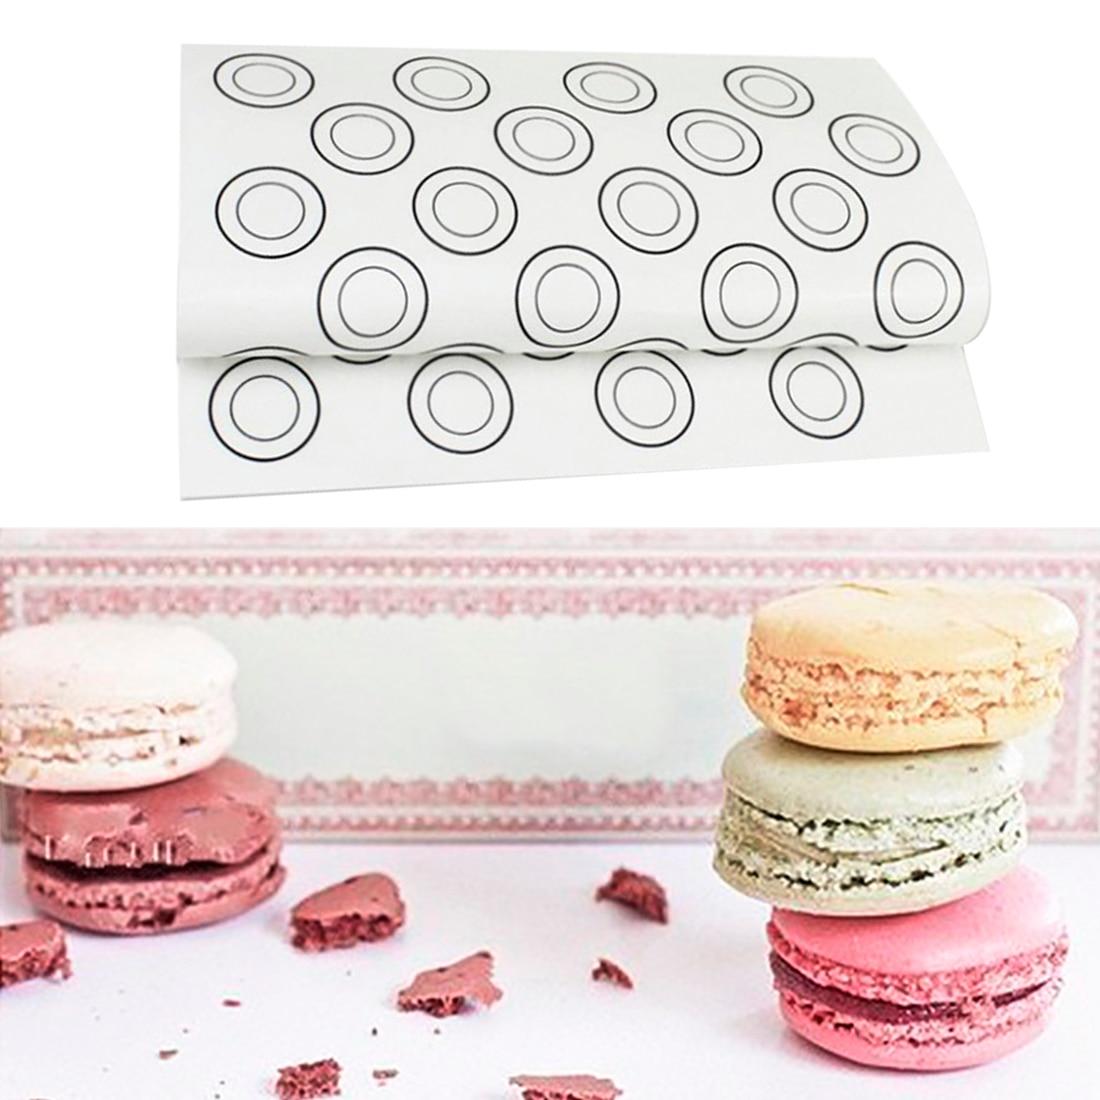 1Pc 40X30cm Silicone Baking Mat Fondant Bakeware Macaron Oven Baking pastry tools Cake Pad Dough Roll Mats Pad